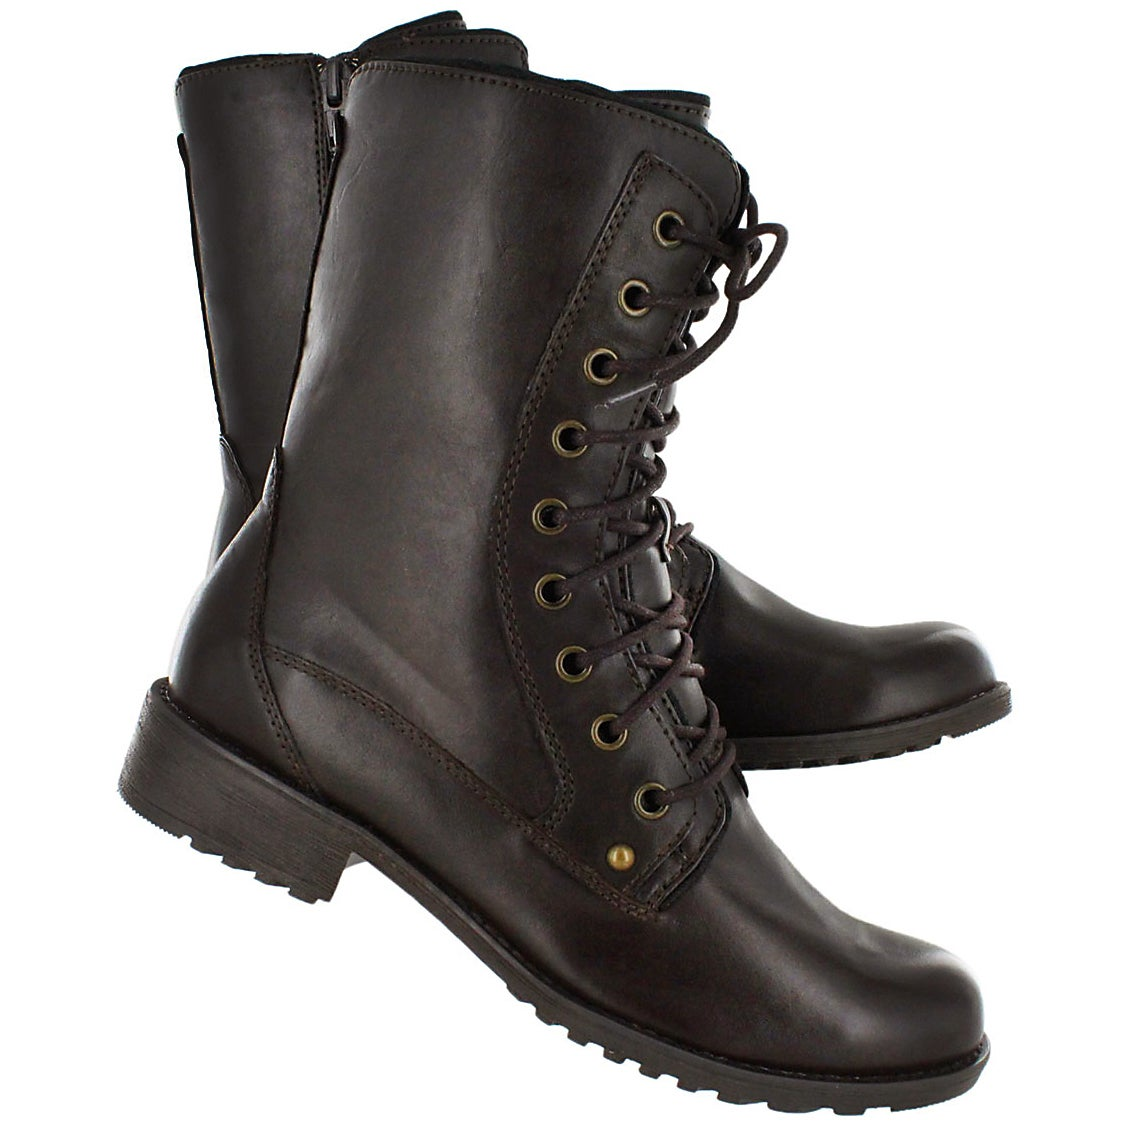 Lds Madison brn waterproof lace boot